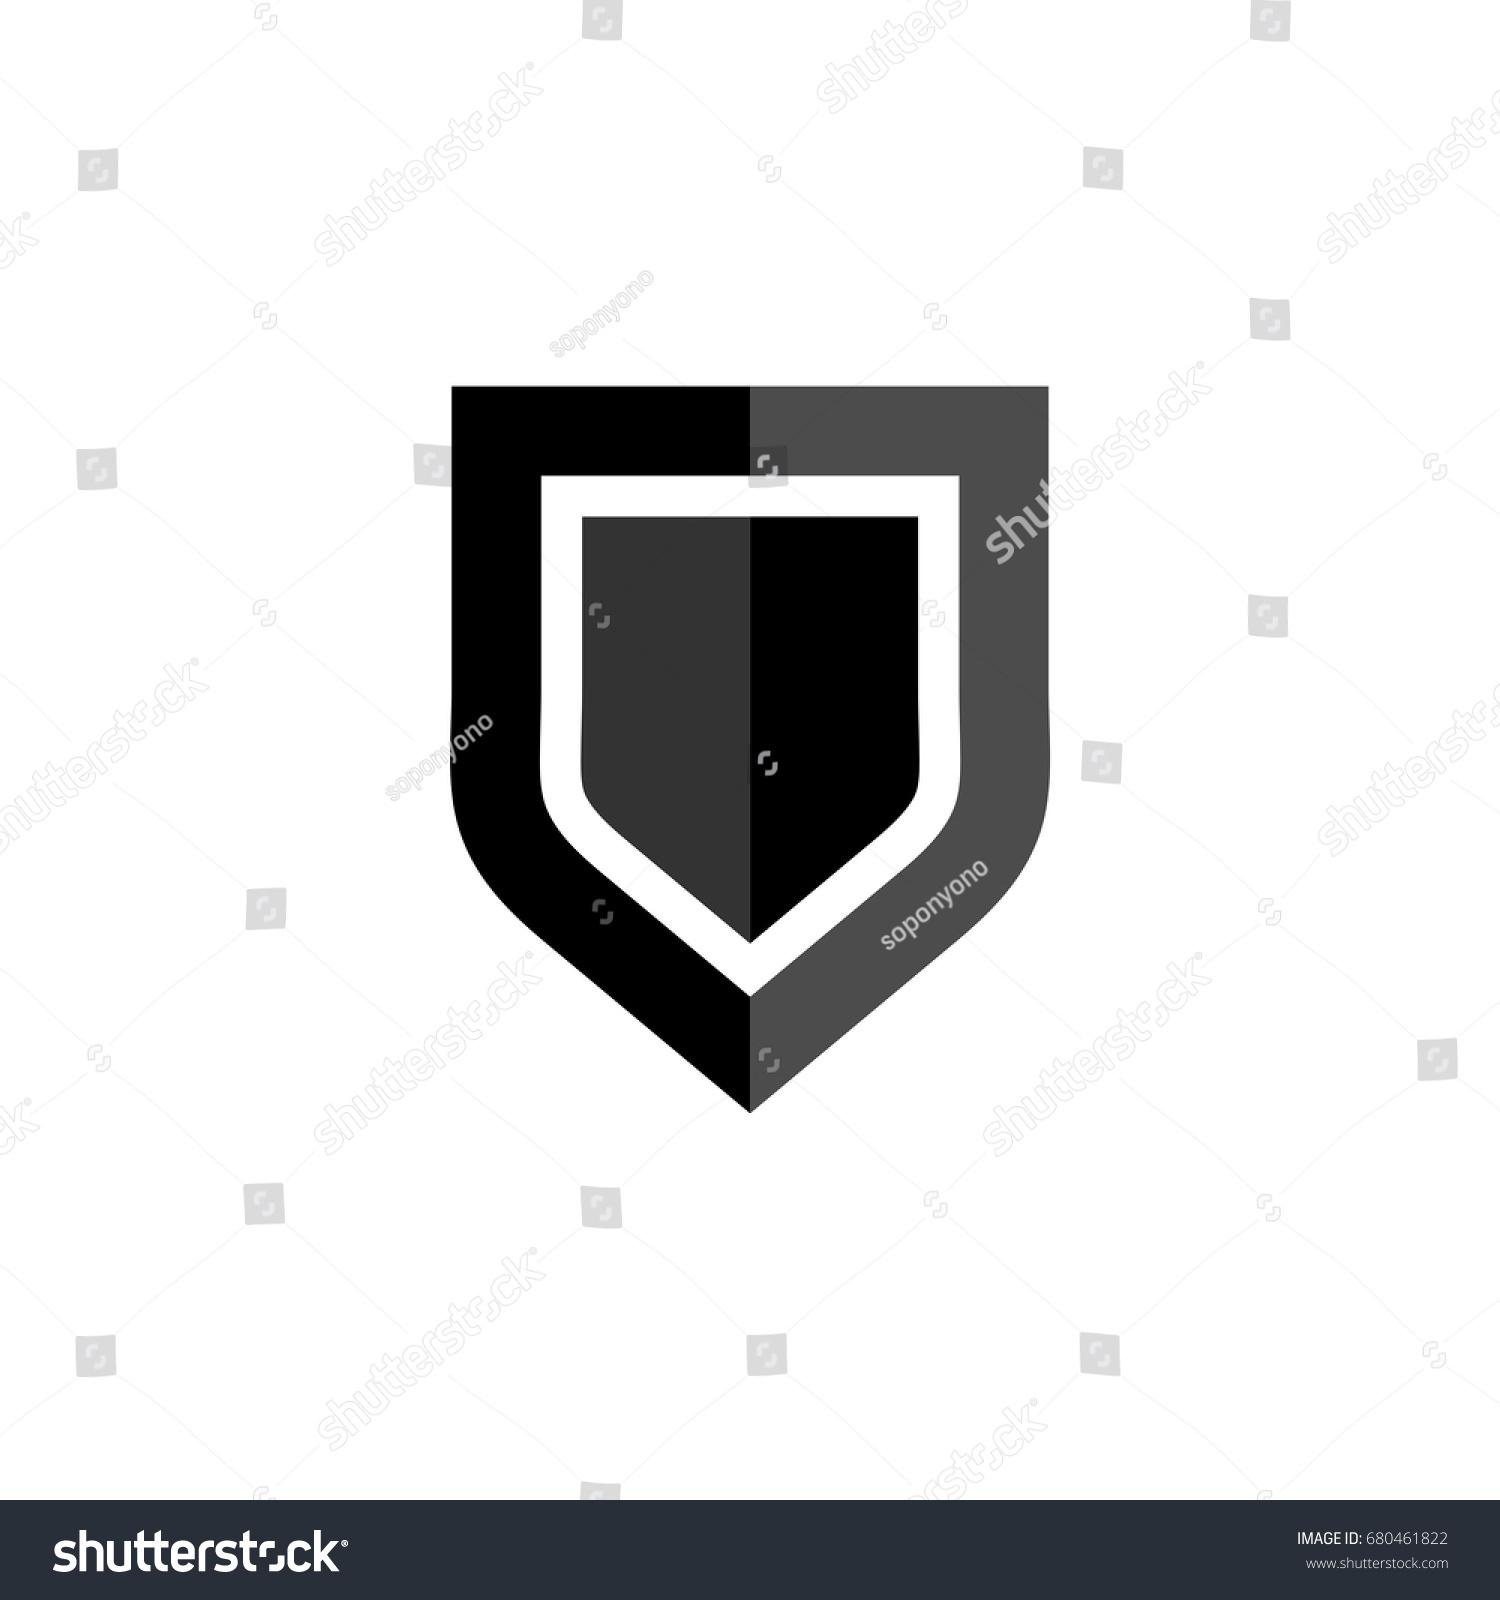 Blank Shield Logo Template Stock Vector (2018) 680461822 - Shutterstock